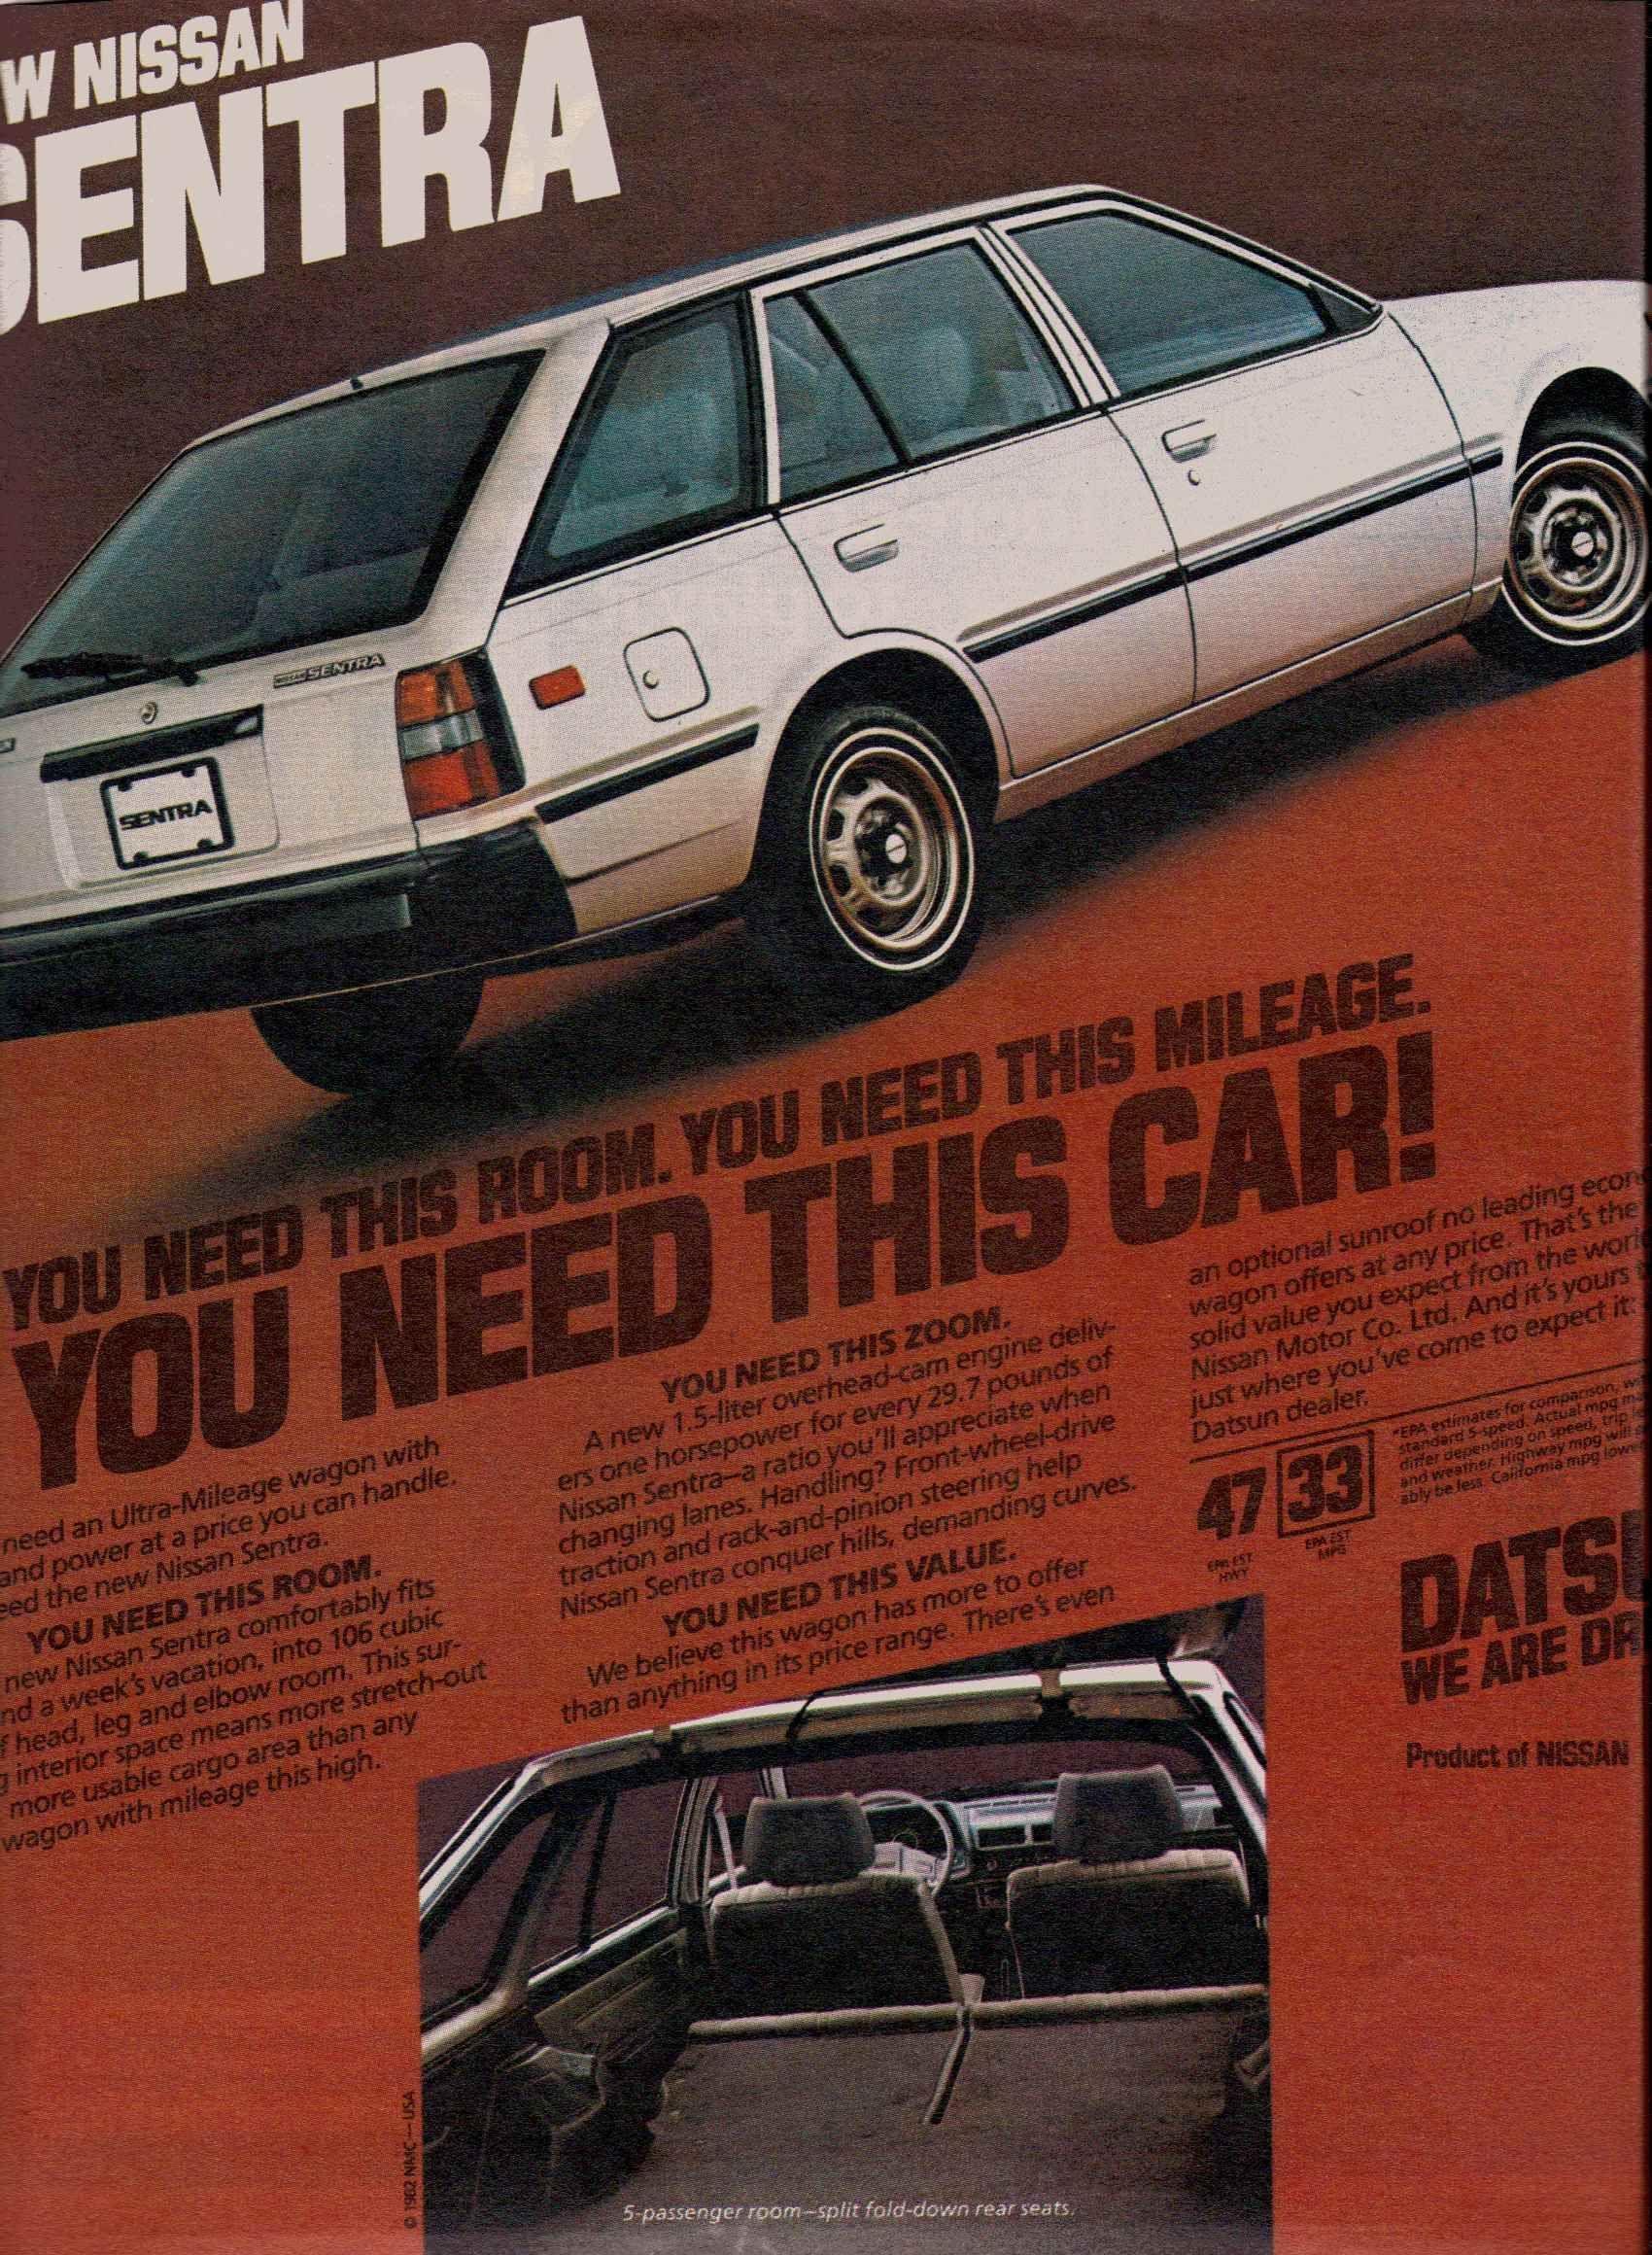 1982 Nissan Sentra wagon ad | Vintage Nissan Vehicle Ads ...